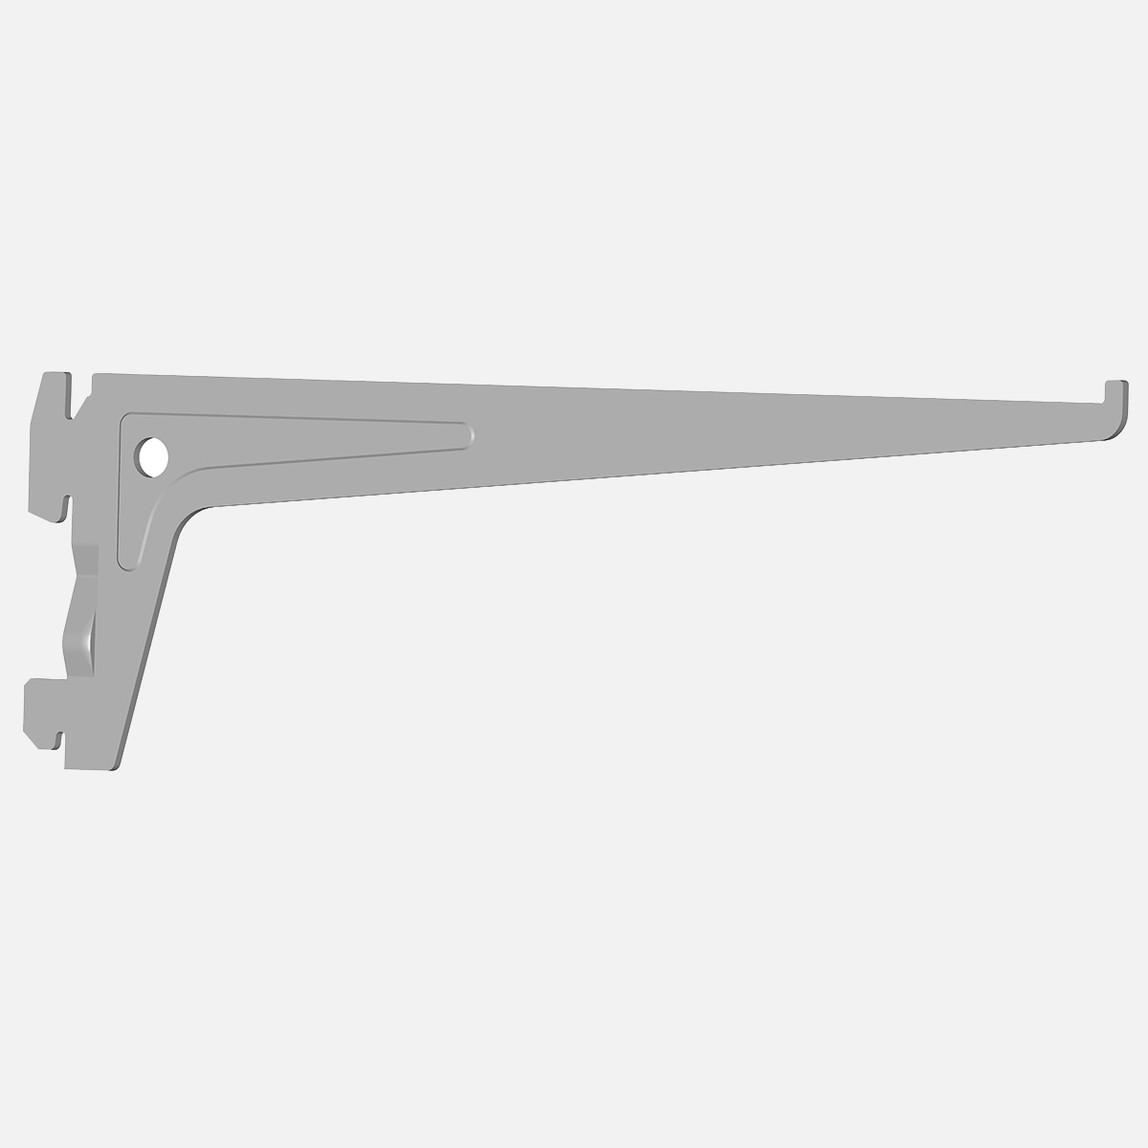 Raf Taşıyıcı Kol, EL50, 250mm, beyaz Alu.